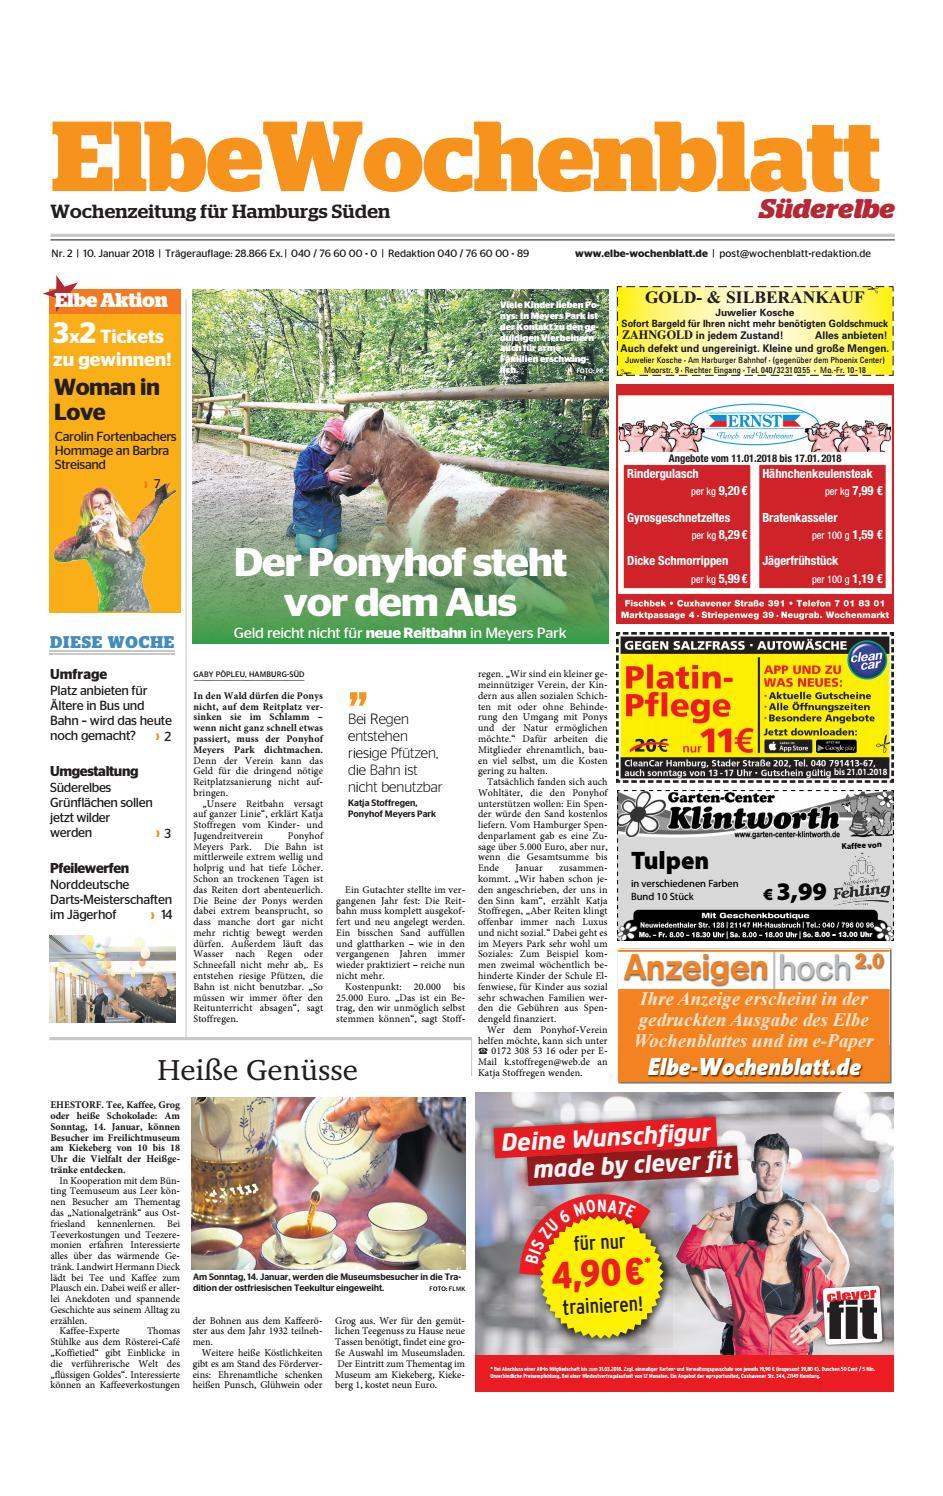 Süderelbe KW02 2018 by Elbe Wochenblatt Verlagsgesellschaft mbH & Co KG issuu